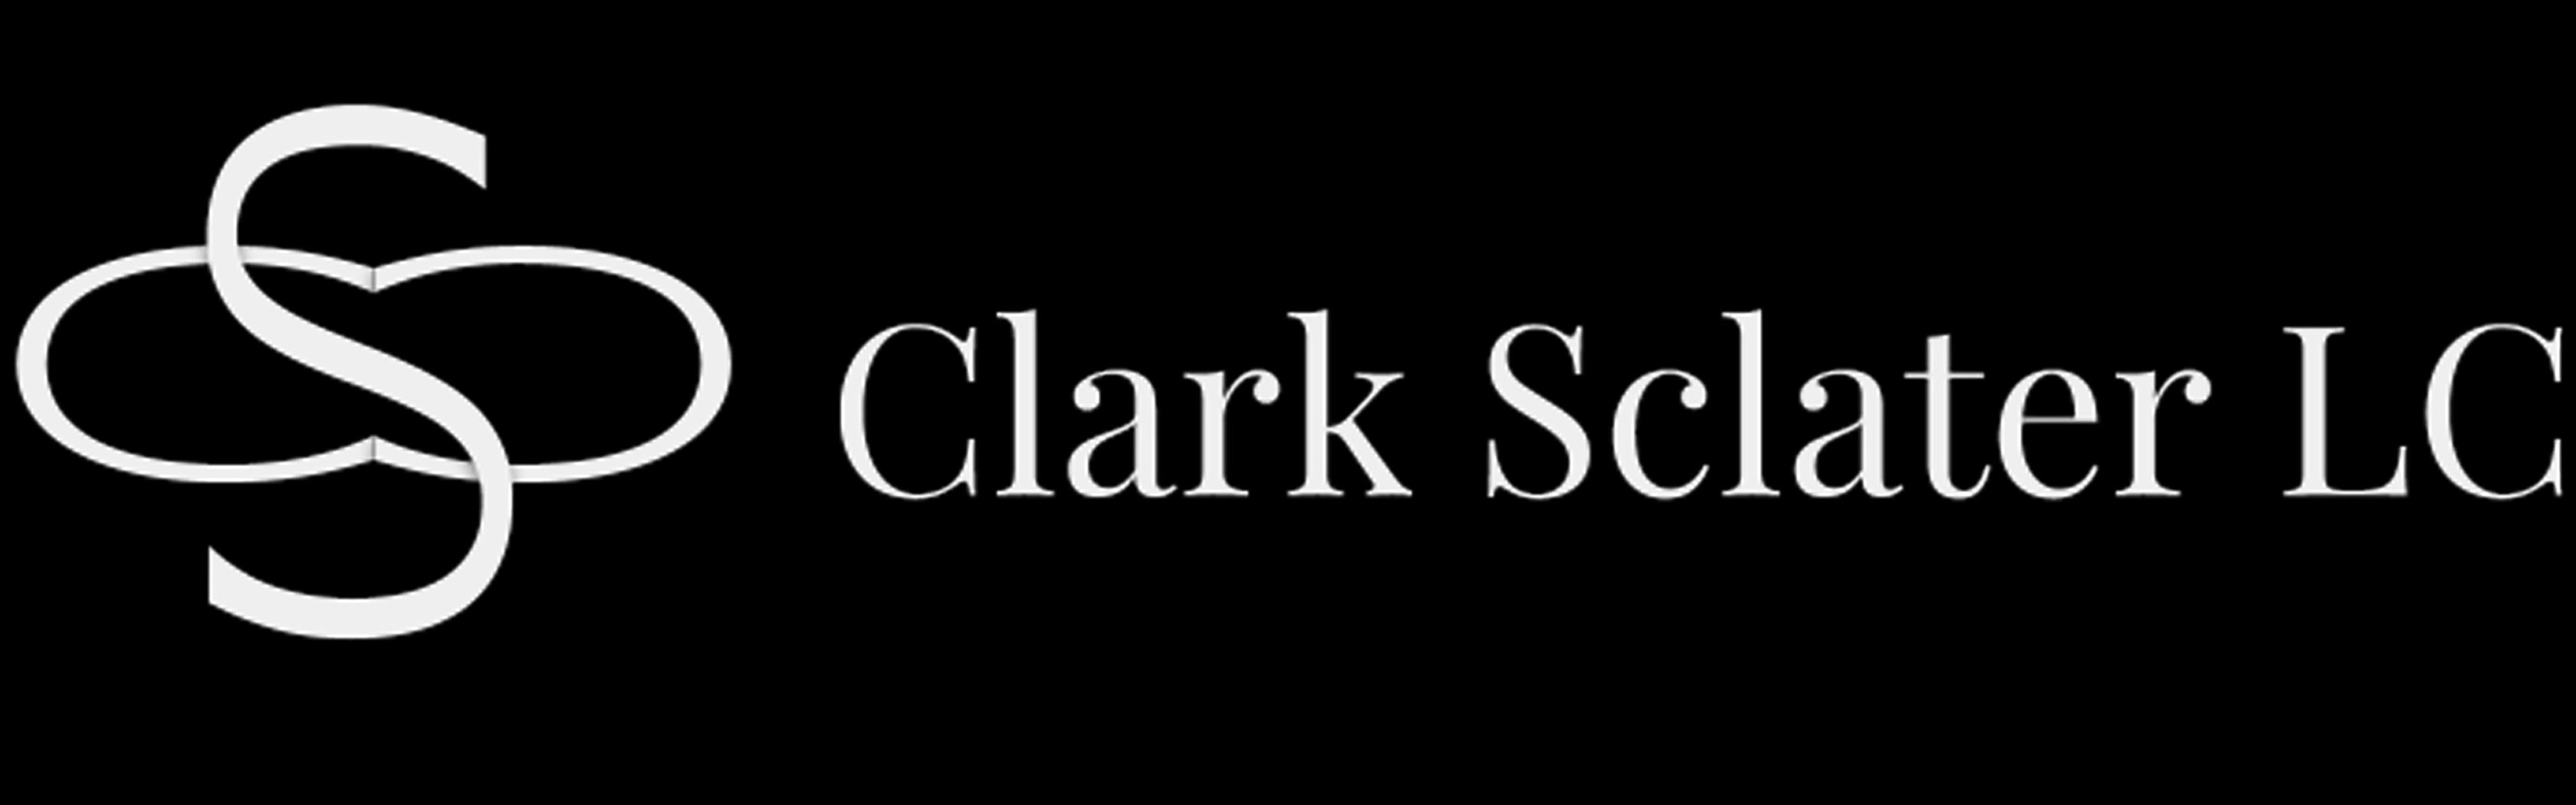 Clark Sclater LC